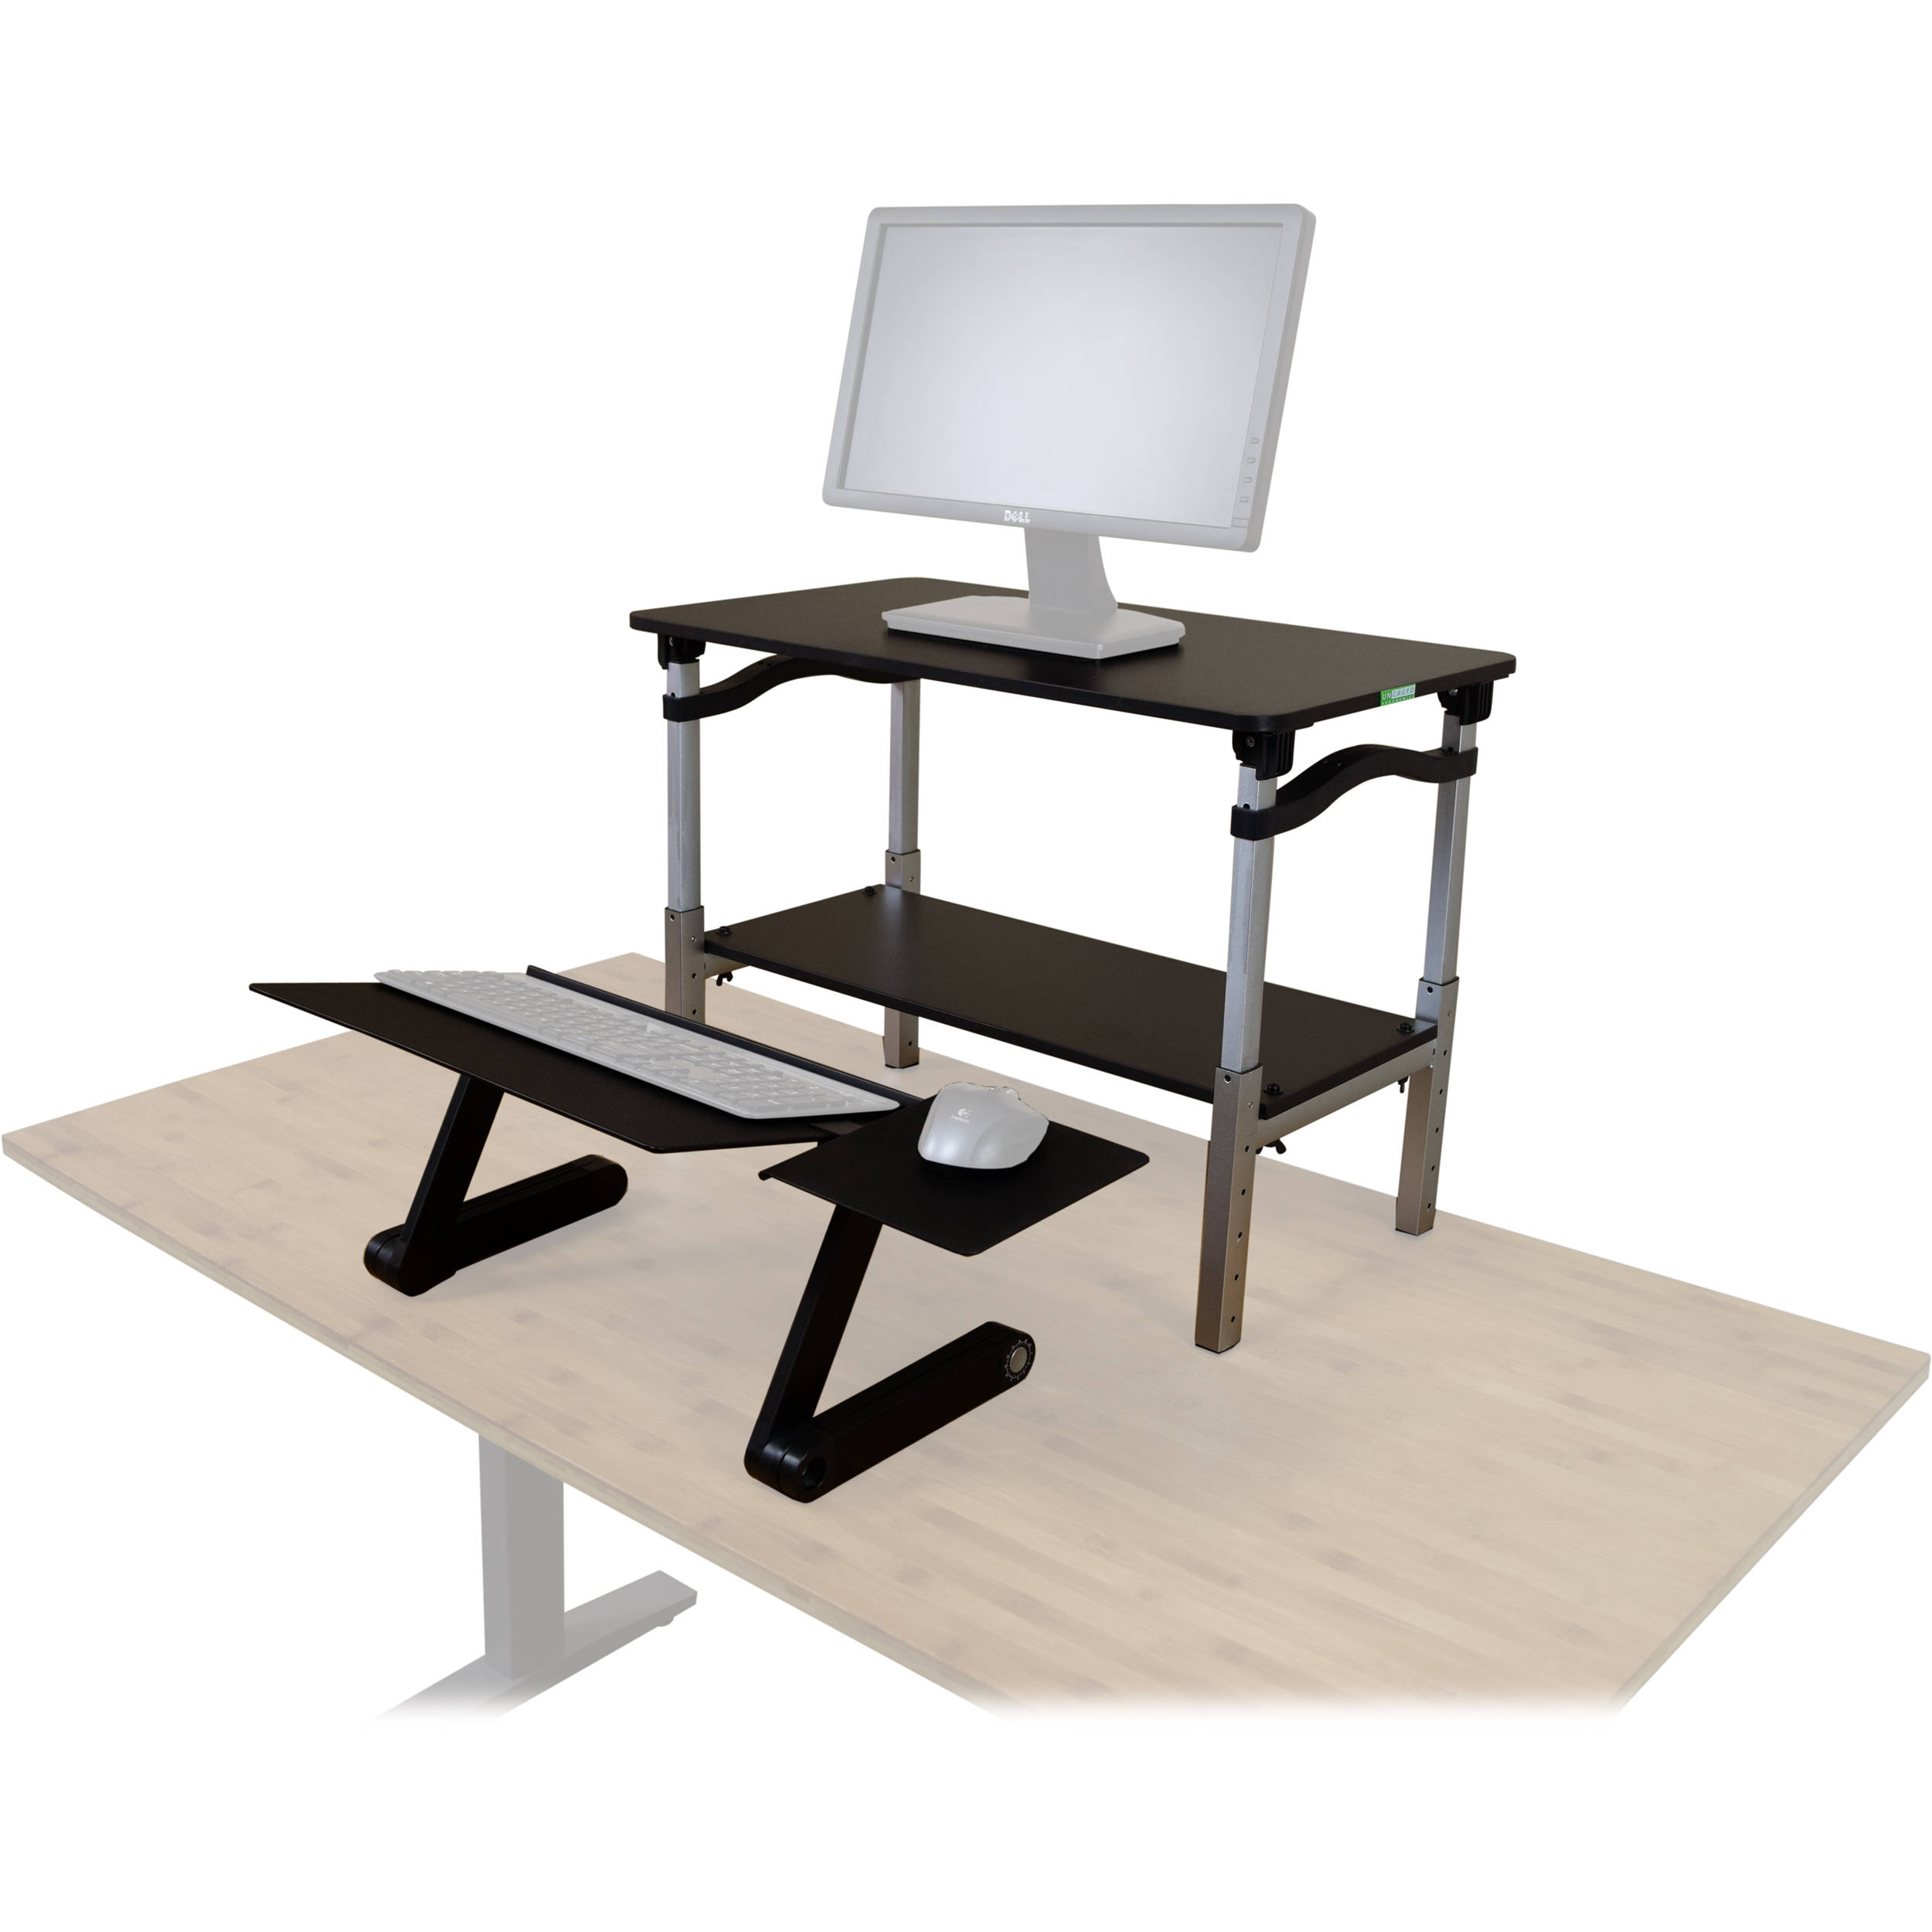 Uncaged Ergonomics Lift Standing Desk Converter (Black)